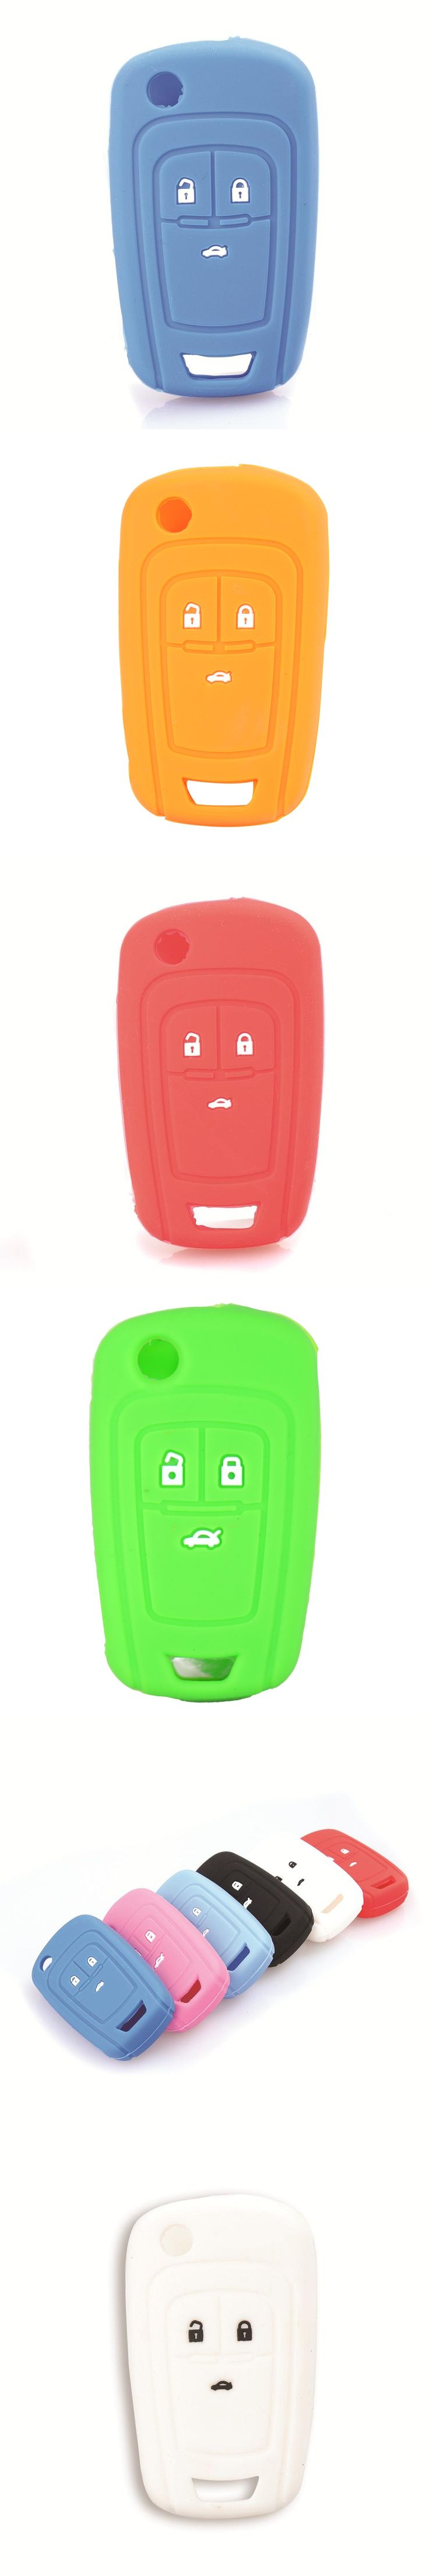 3 Buttons Silicone Car Key Cover Case For Chevrolet Cruze 2013 Spark Onix Silverado Volt Camaro Aveo Sonic Remote